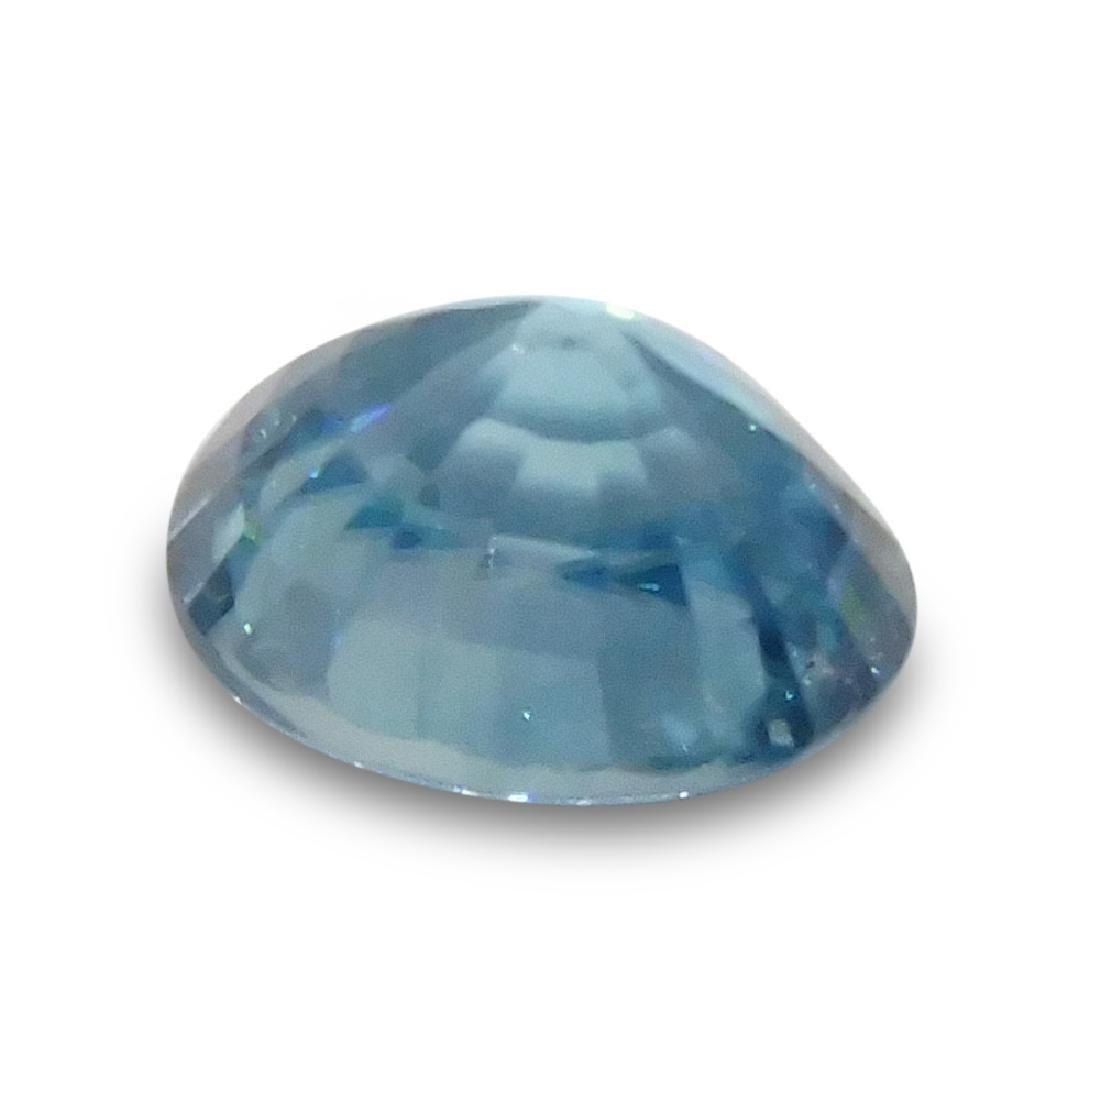 4.21 Carat Loose Oval Blue Zircon - 4